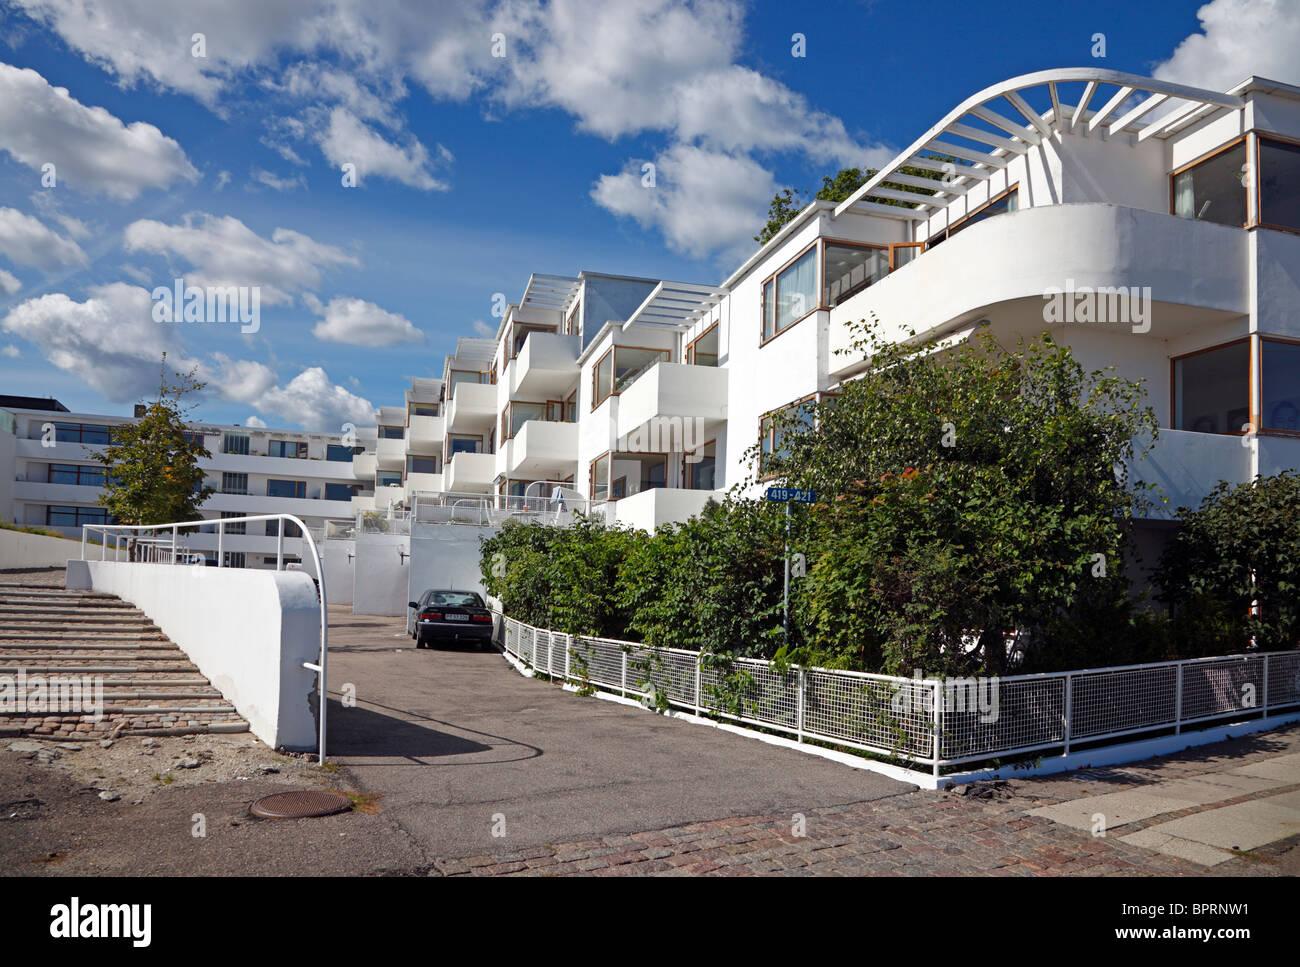 The Bellavista apartment building in Klampenborg near Copenhagen, Denmark, designed by modernist architect Arne Jacobsen. Arne Jacobsen architecture. Stock Photo